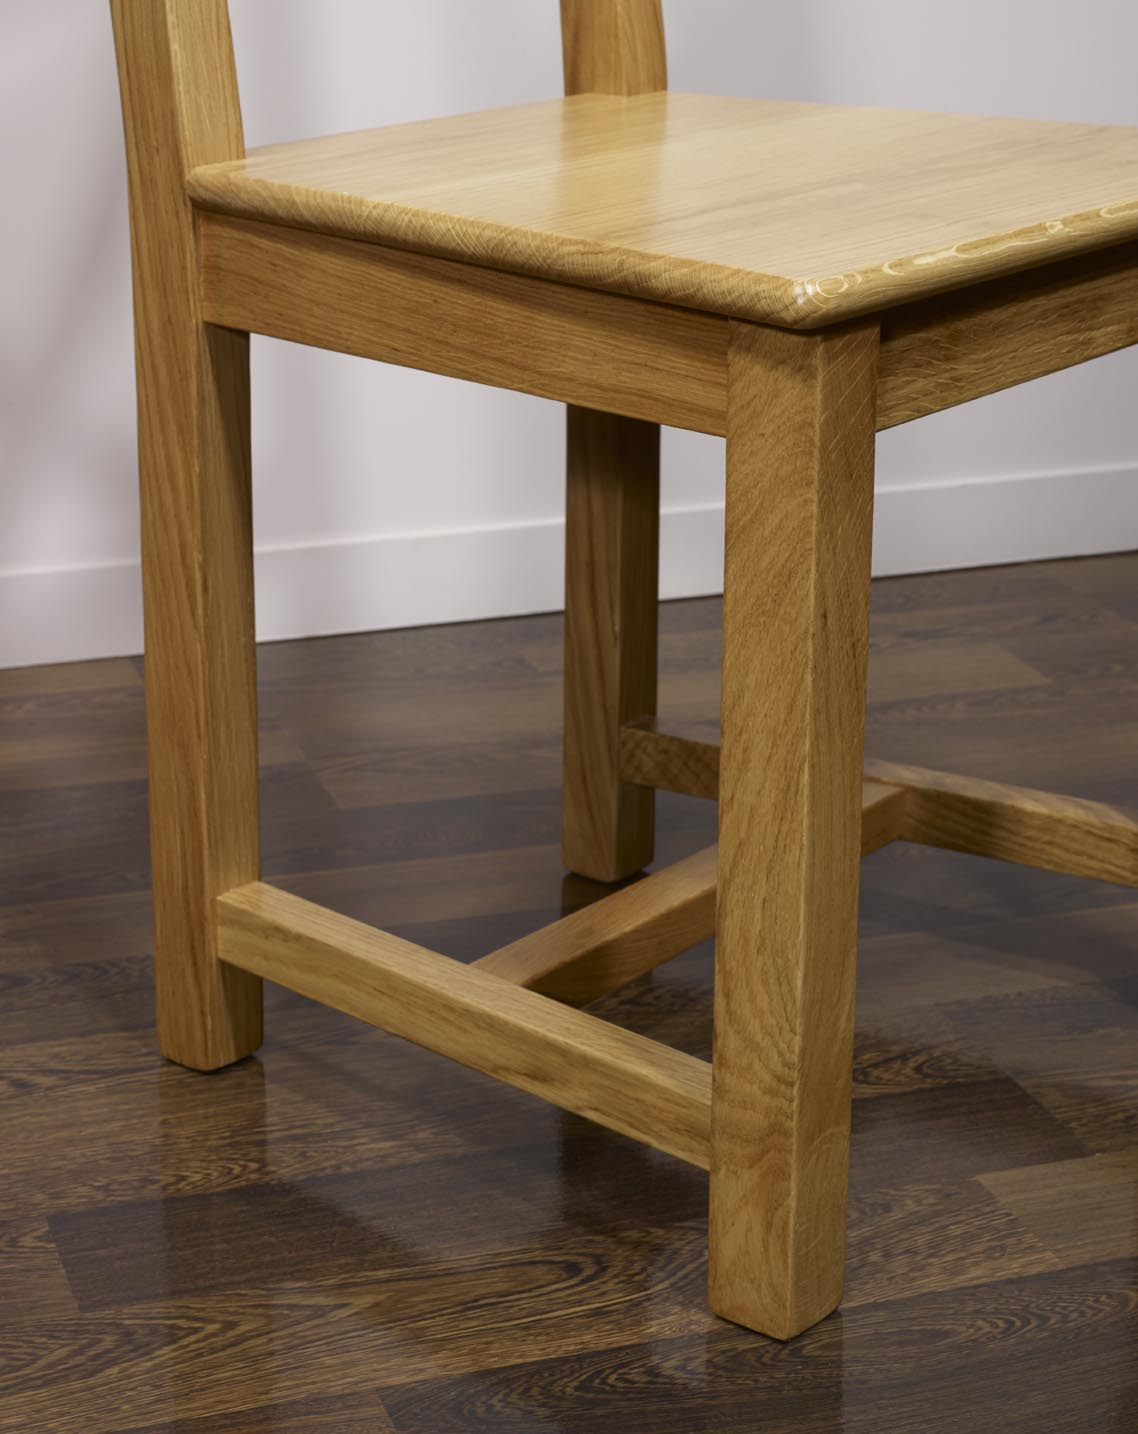 Chaise olivier en ch ne massif de style campagne assise ch ne meuble en ch ne massif for Meuble chambre style campagne